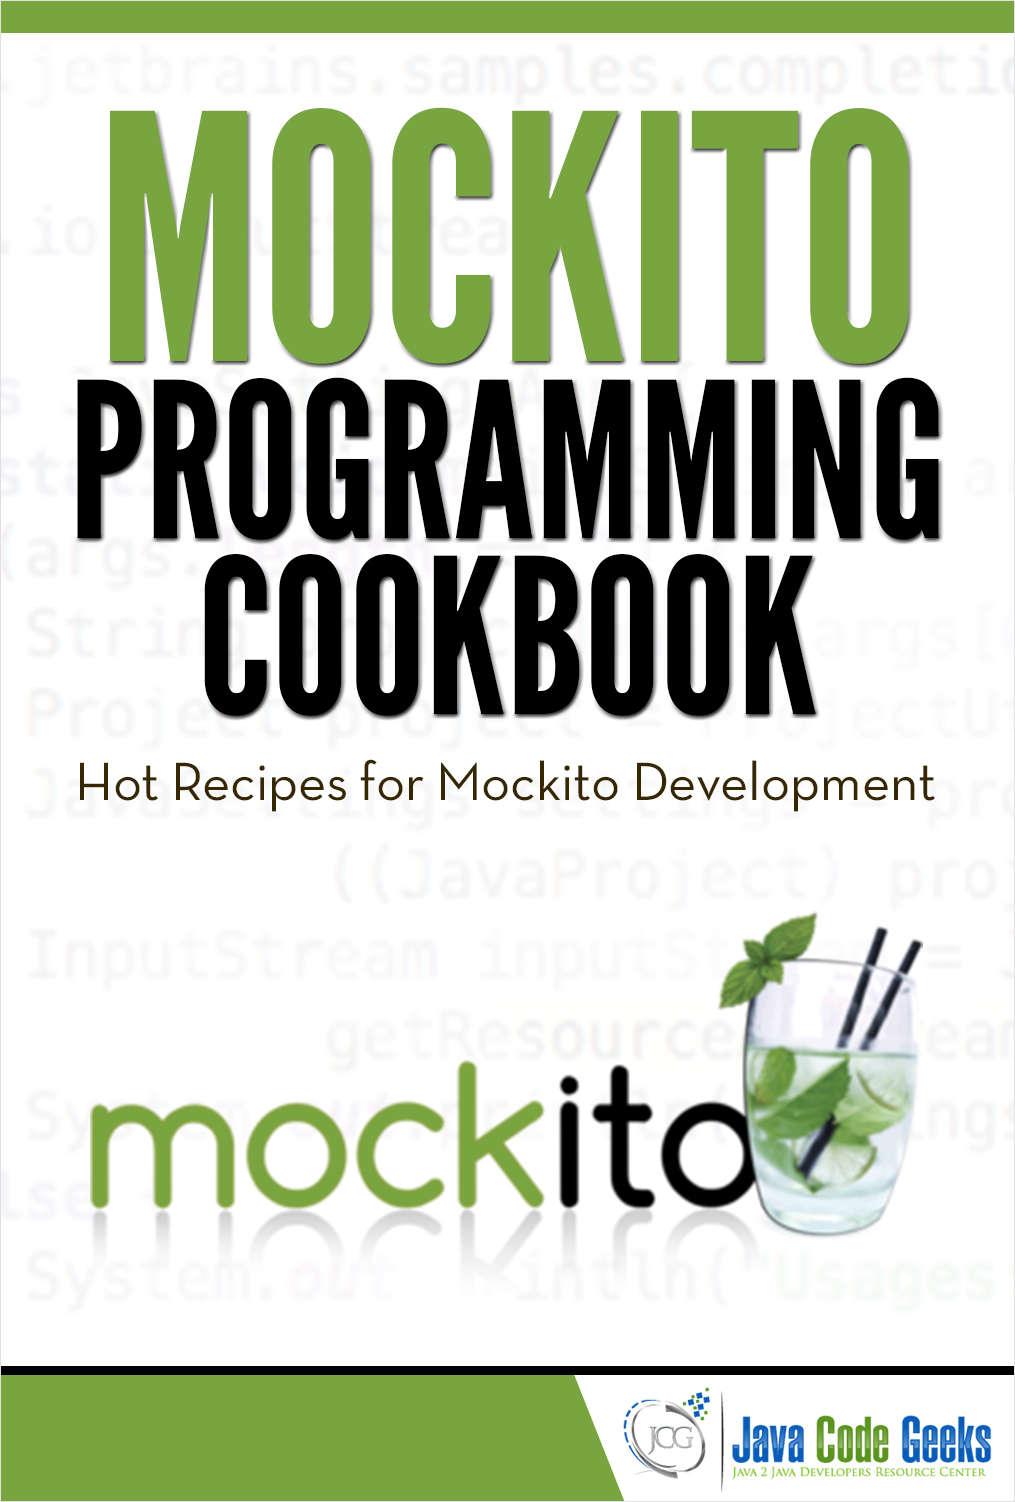 Mockito Programming Cookbook